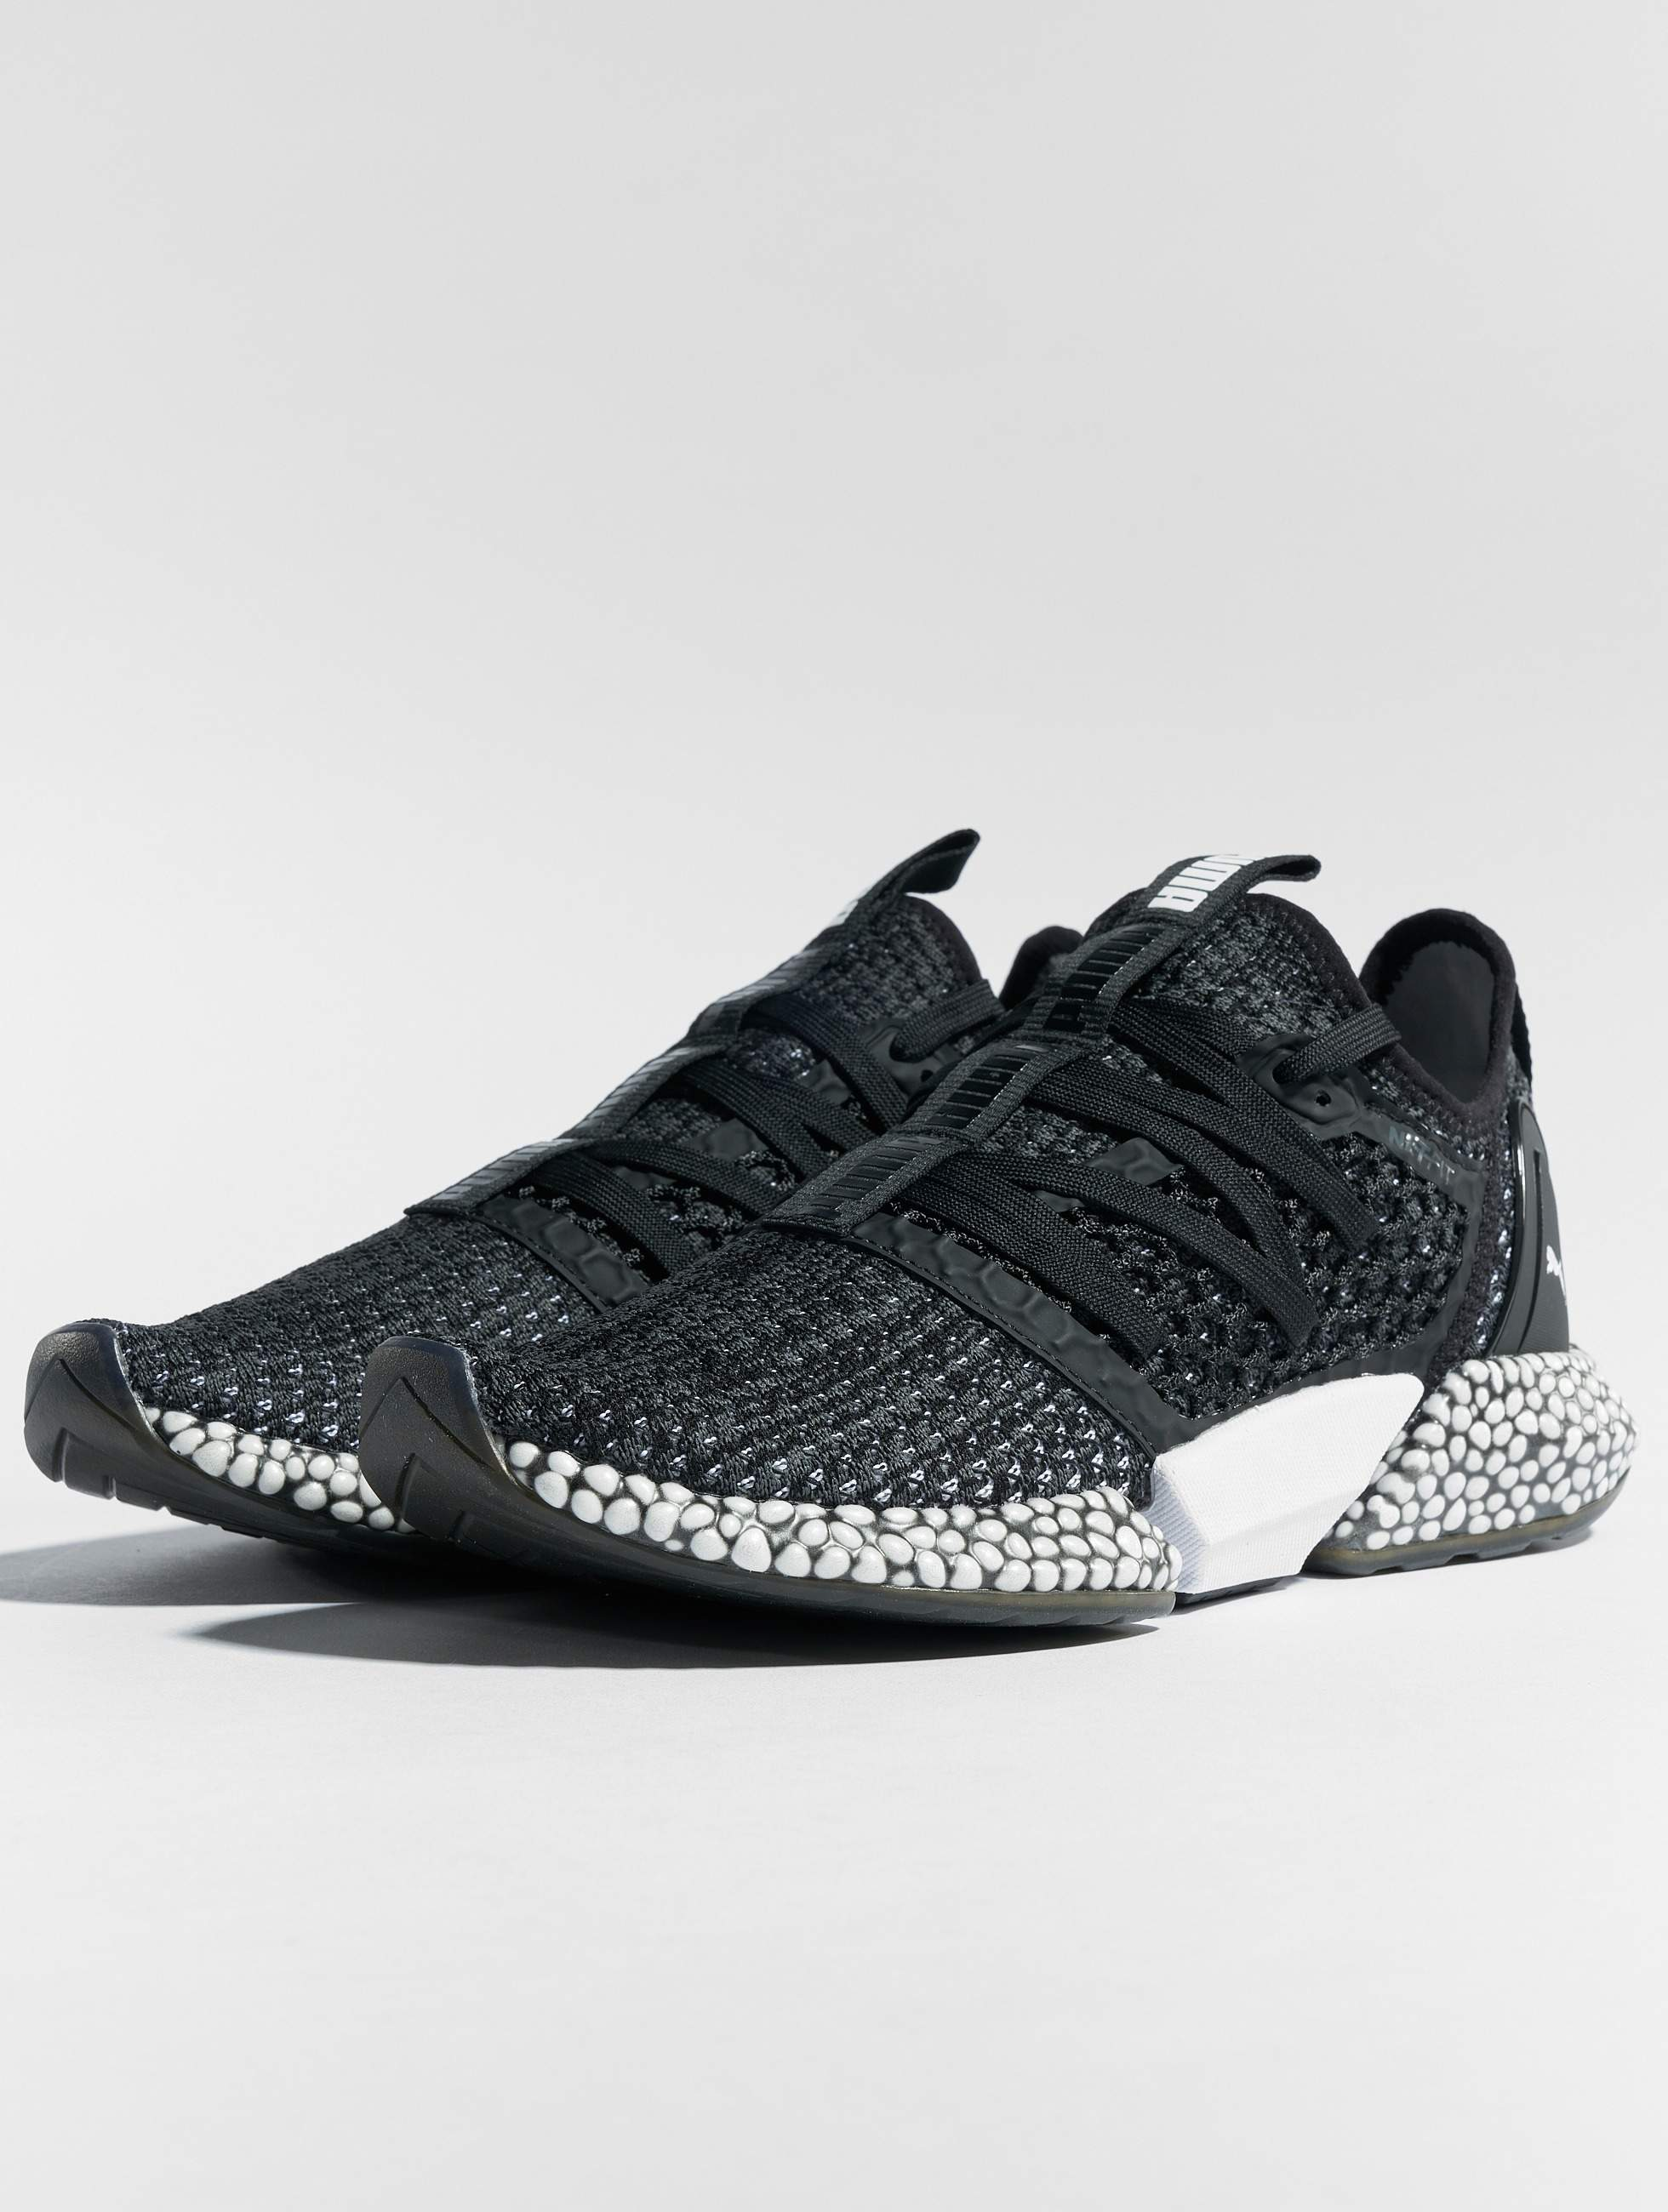 Sneakers Netfit Puma Hybrid Rocket Blackiron Gate FJucl1KT3